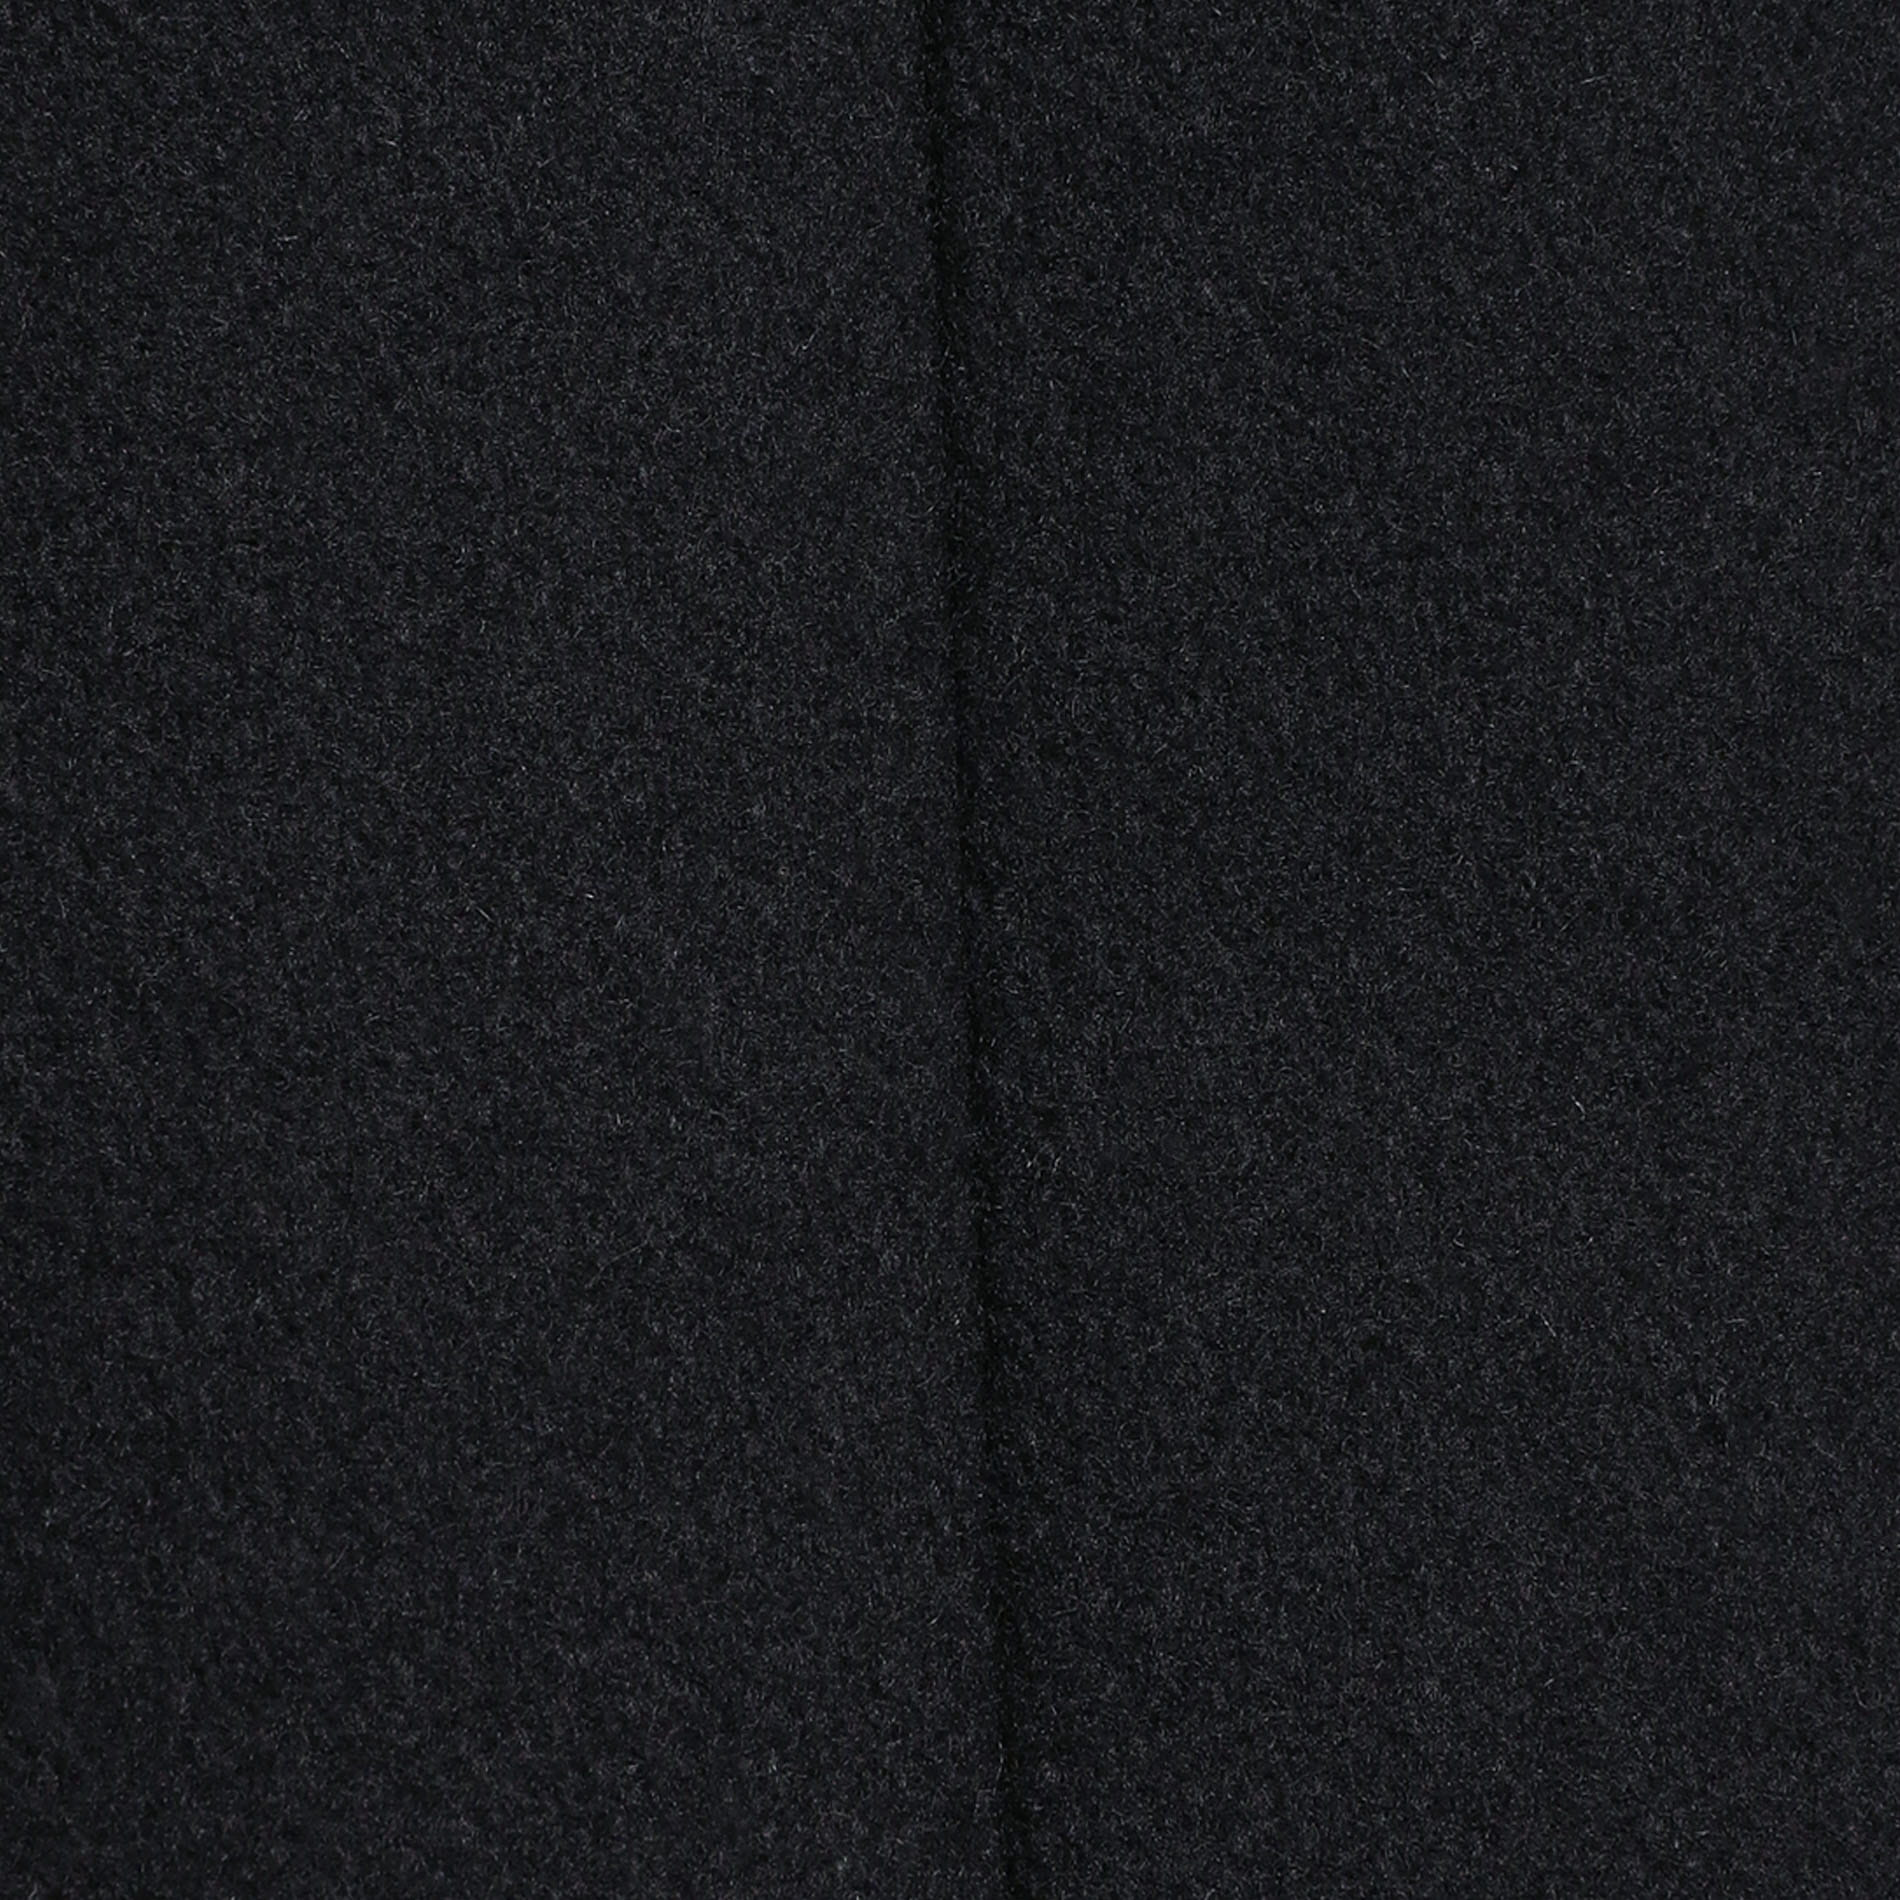 【Milior】 ライダース コート